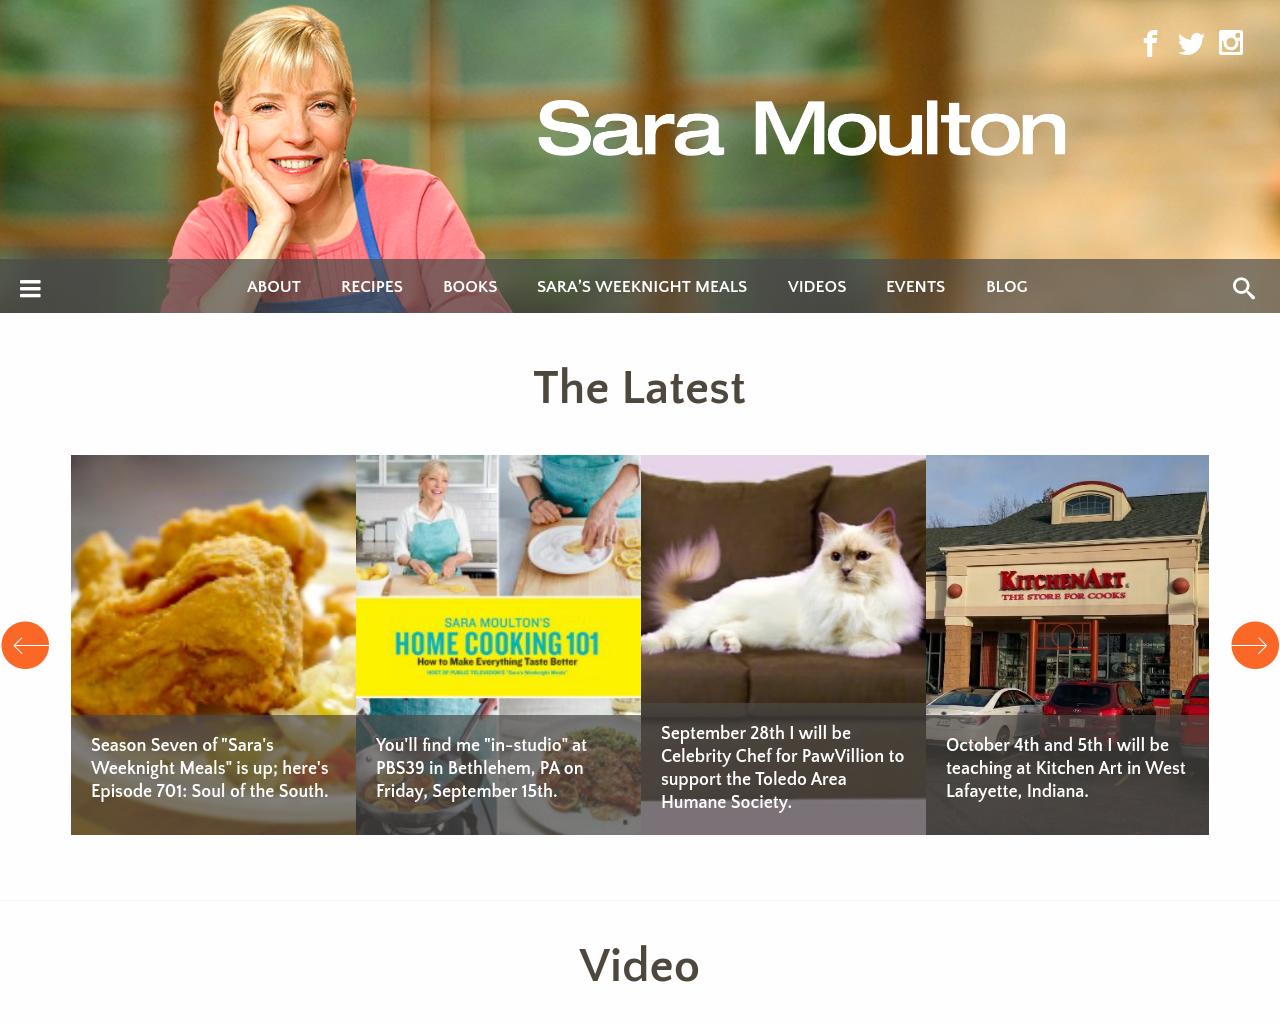 Sara-Moulton-Advertising-Reviews-Pricing